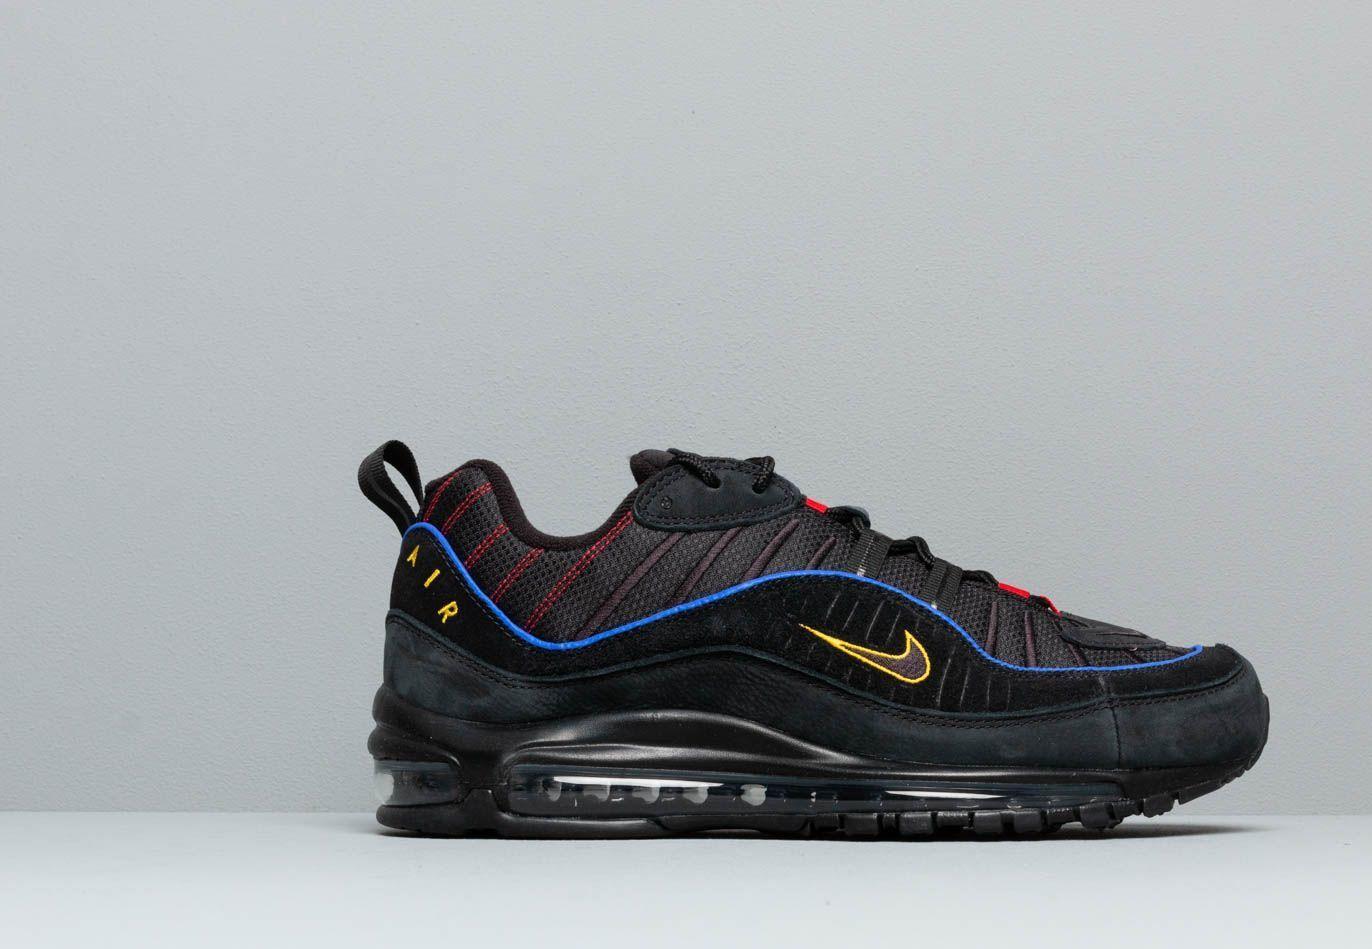 Air Max 98 Black/ Black-Amarillo-University Red Nike pour homme - Lyst